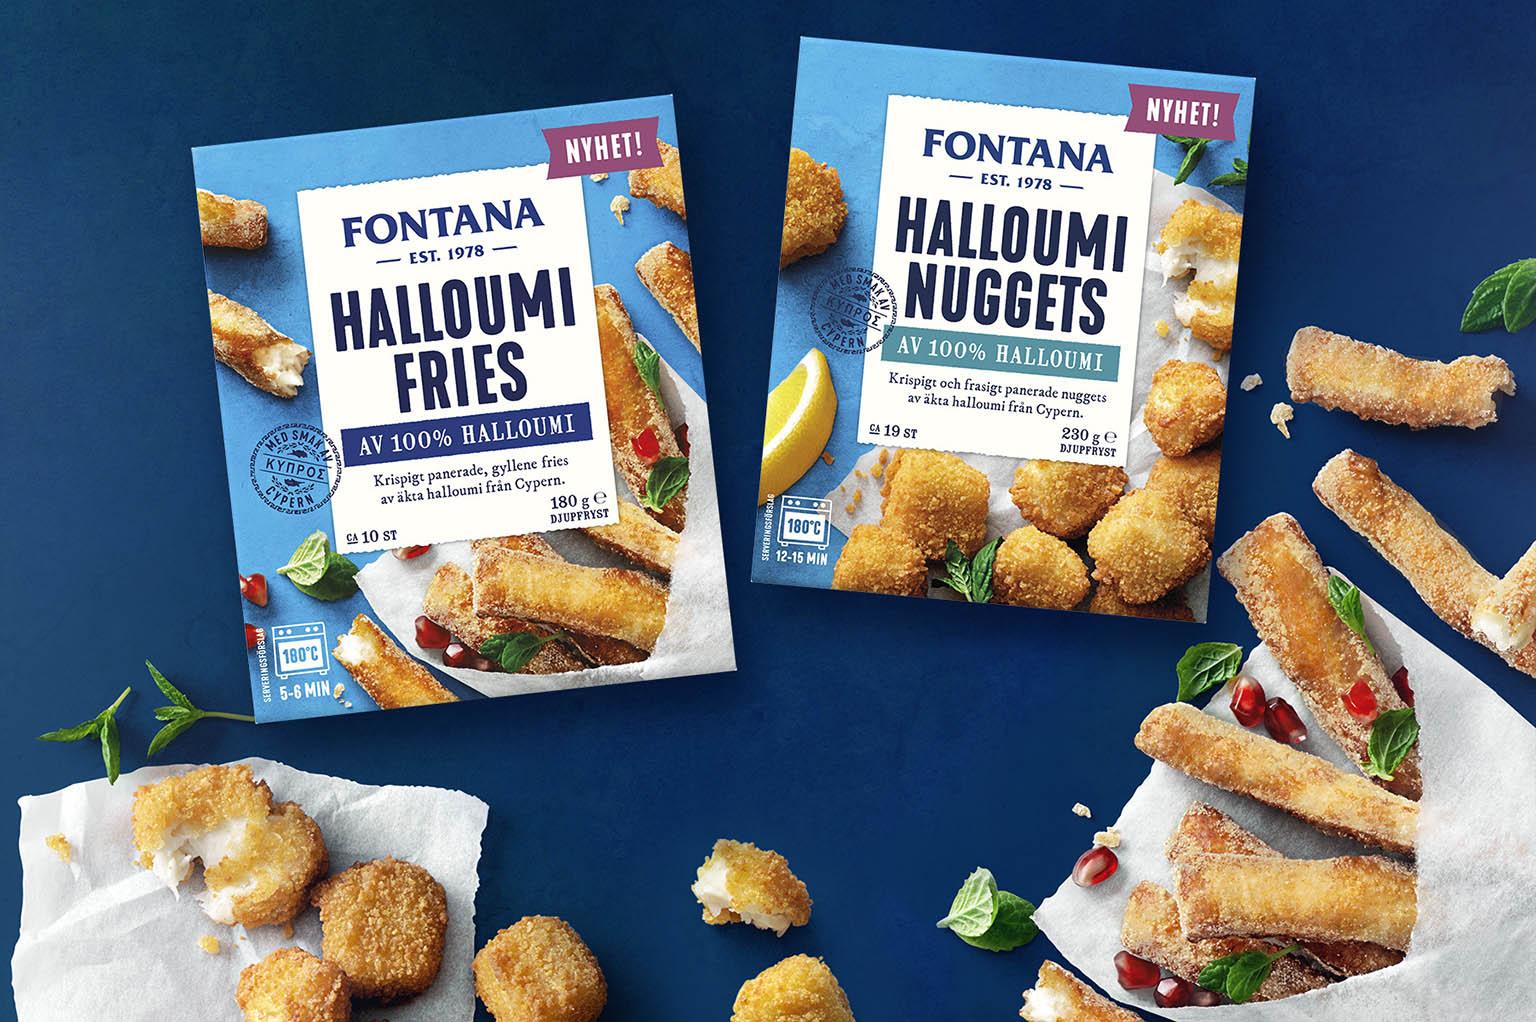 Fontana Halloumi Fries och Nuggets